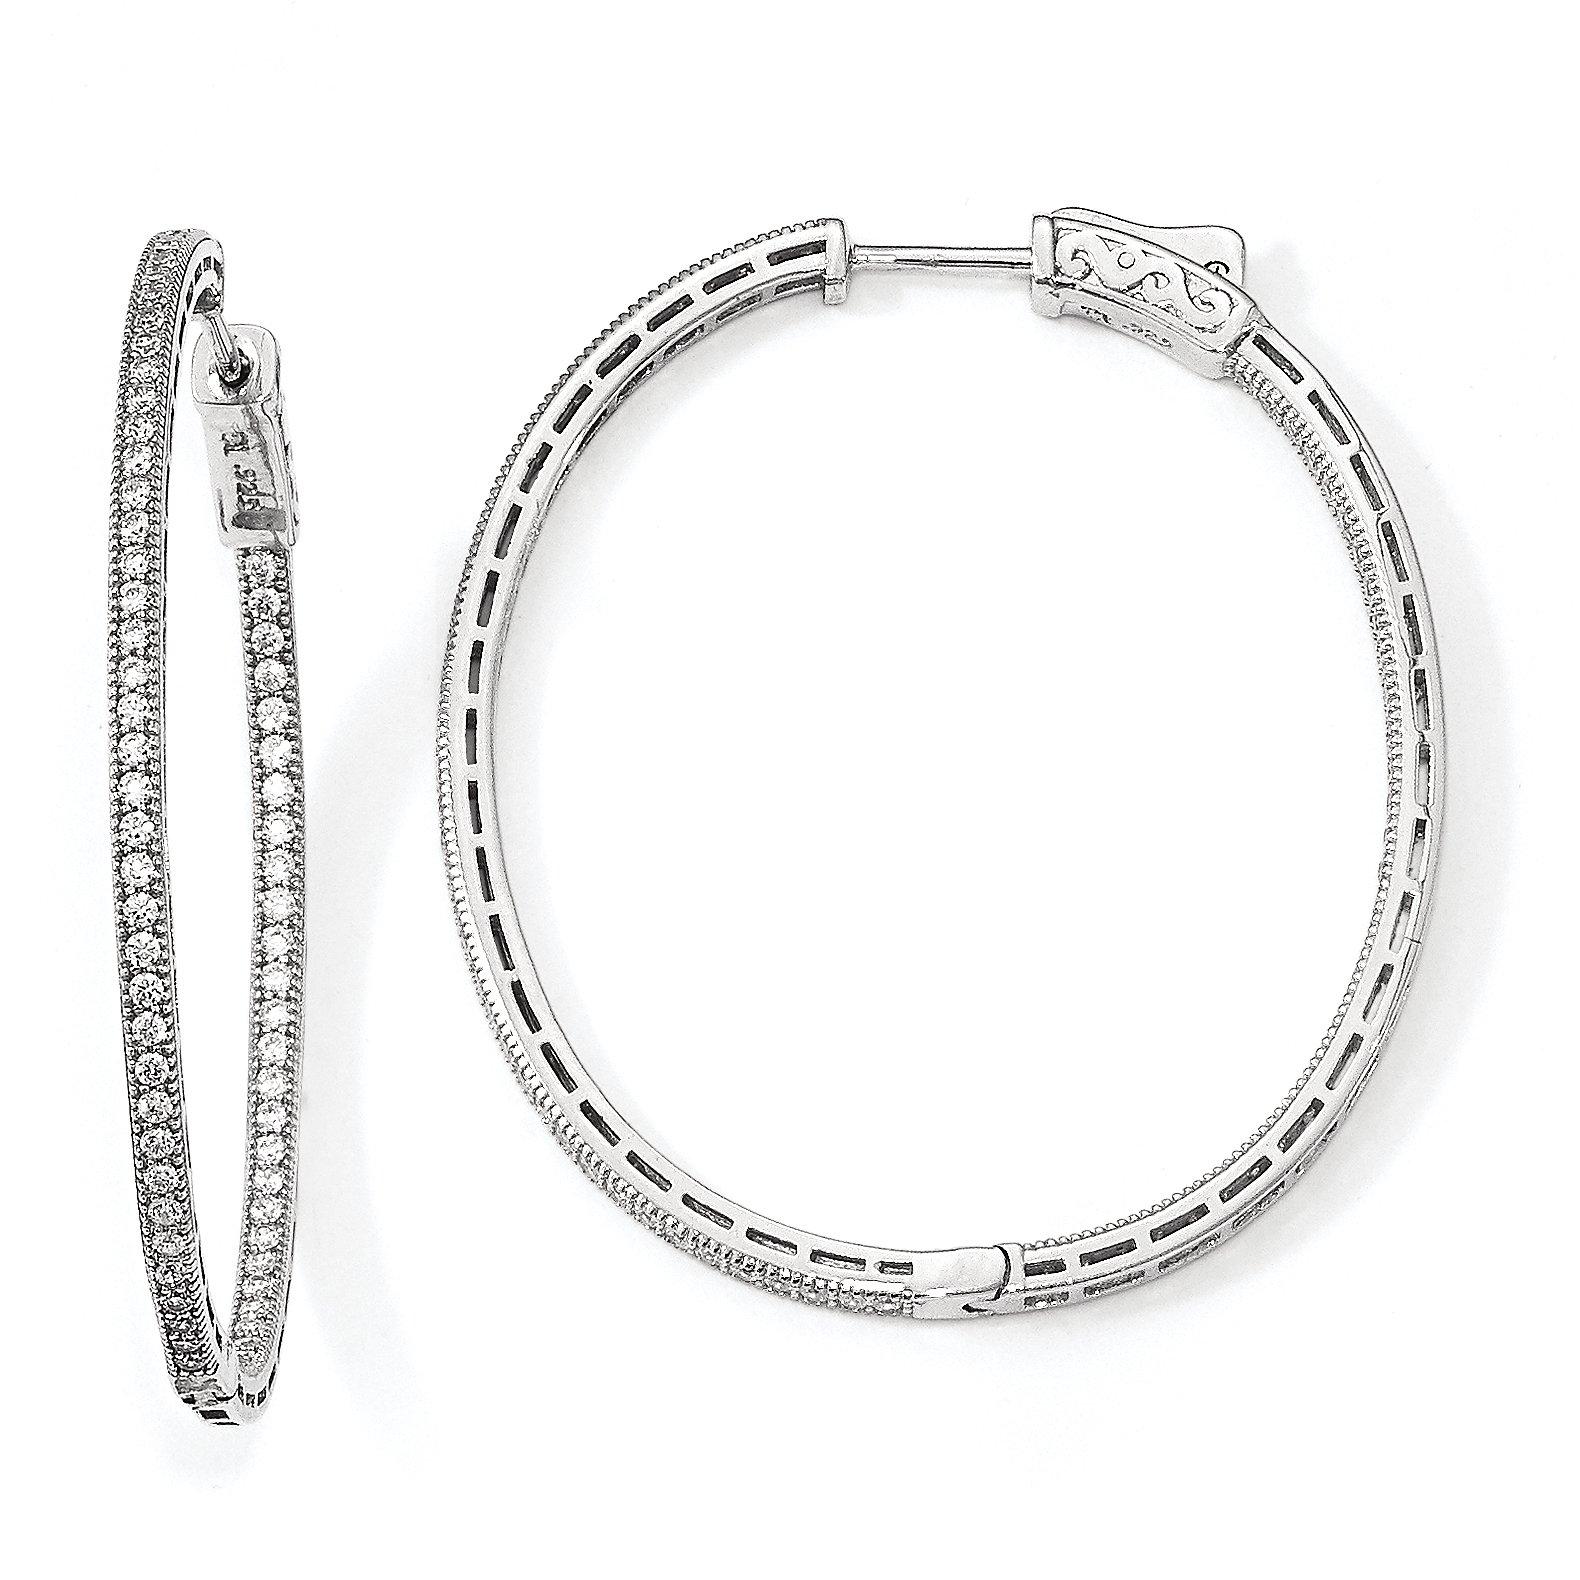 ICE CARATS 925 Sterling Silver Cubic Zirconia Cz Oval In Out Hoop Earrings Ear Hoops Set Shimmer Fine Jewelry Gift Set For Women Heart